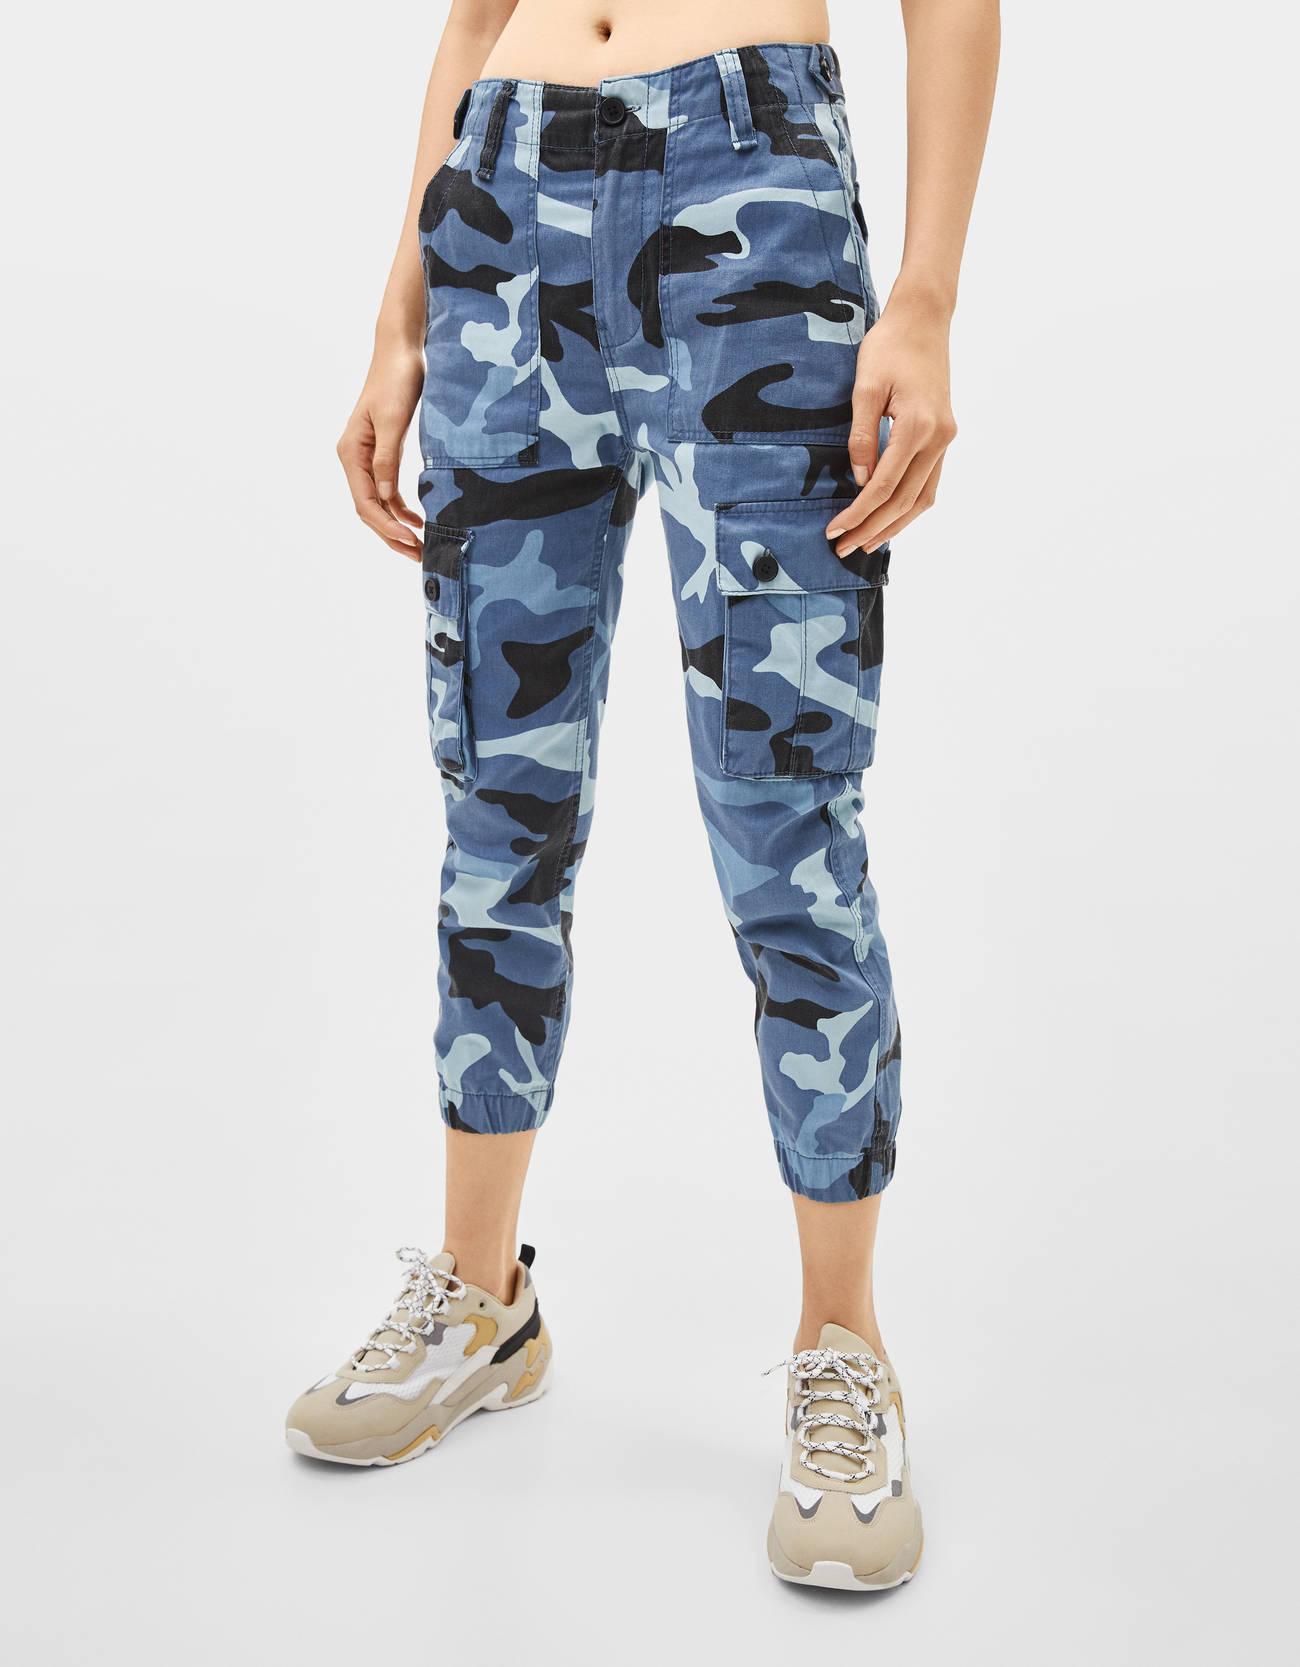 Modalite Net Bershka Cargo Pants